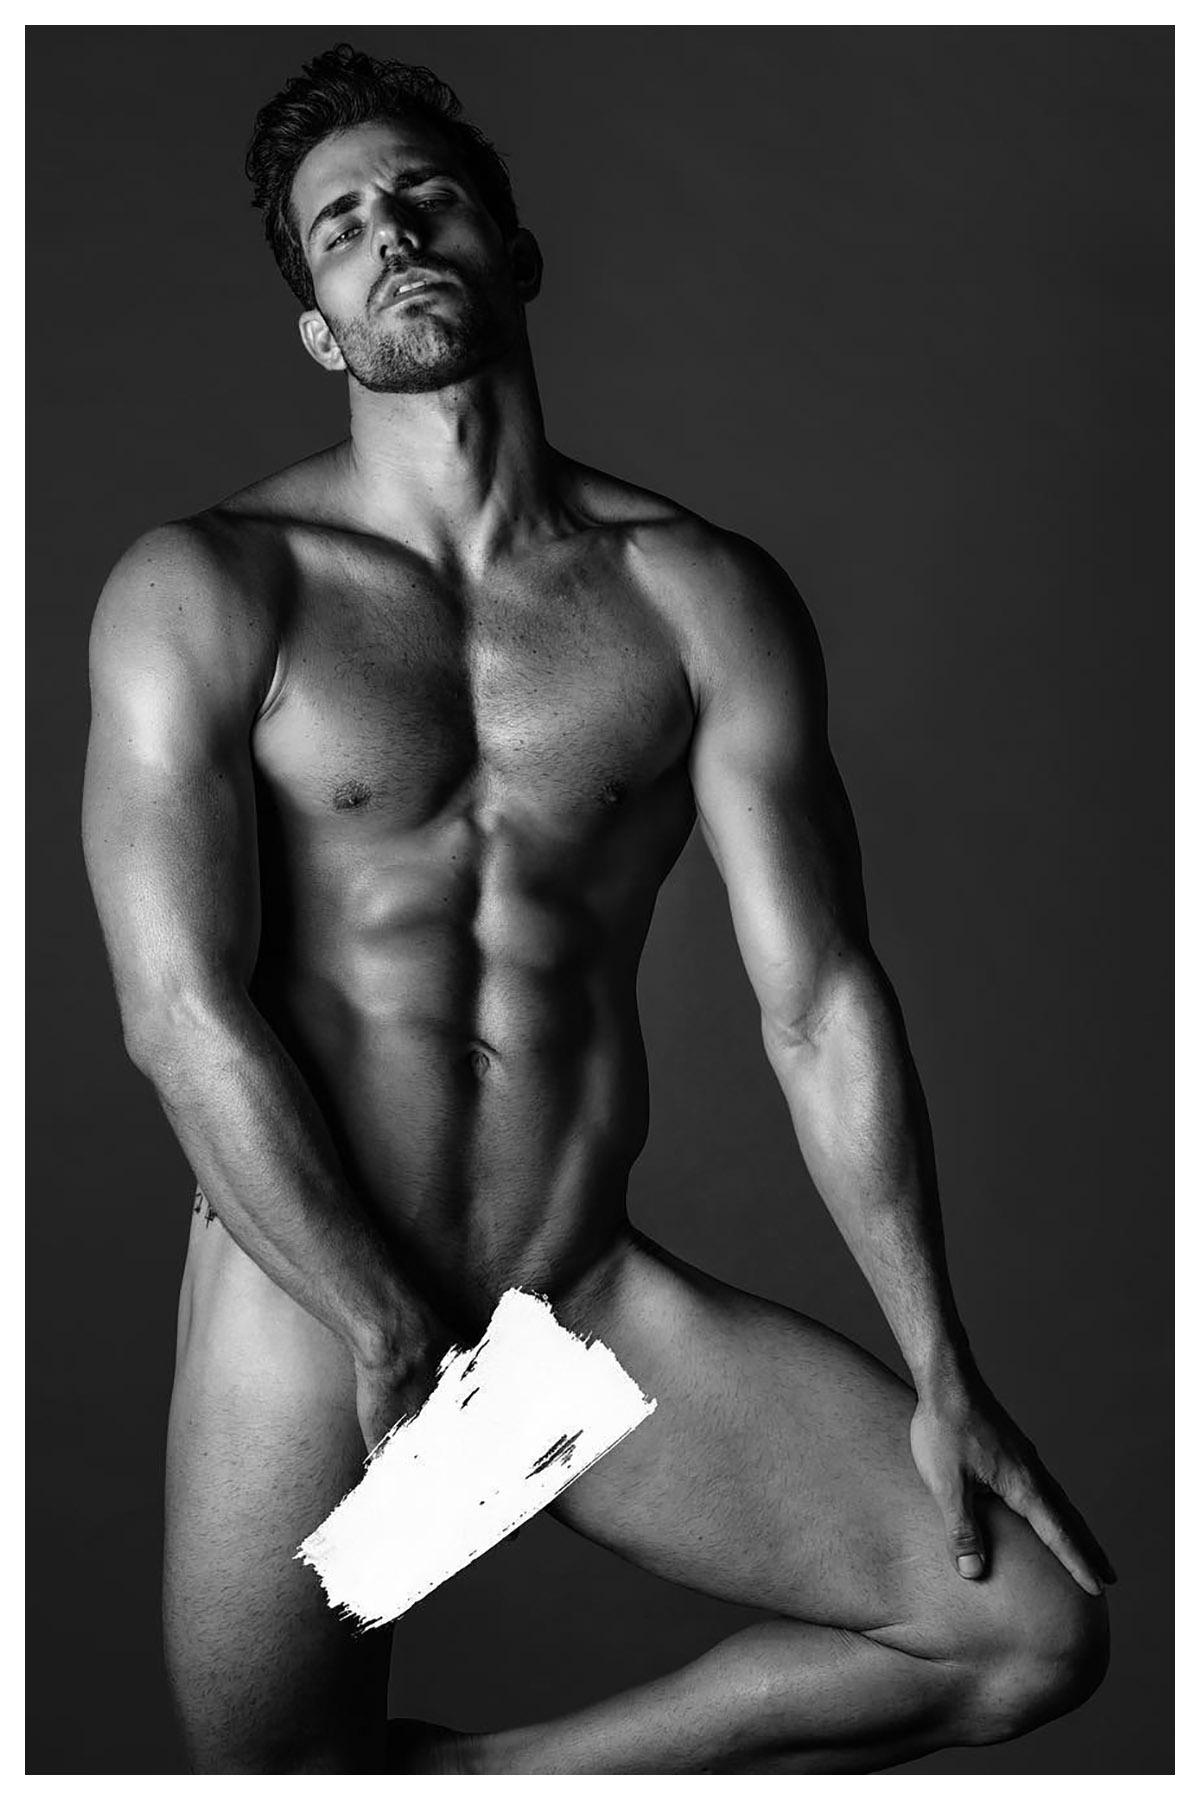 Hugo Tenorio X Wong Sim X Brazilian Male Model X YUP MAGAZINE